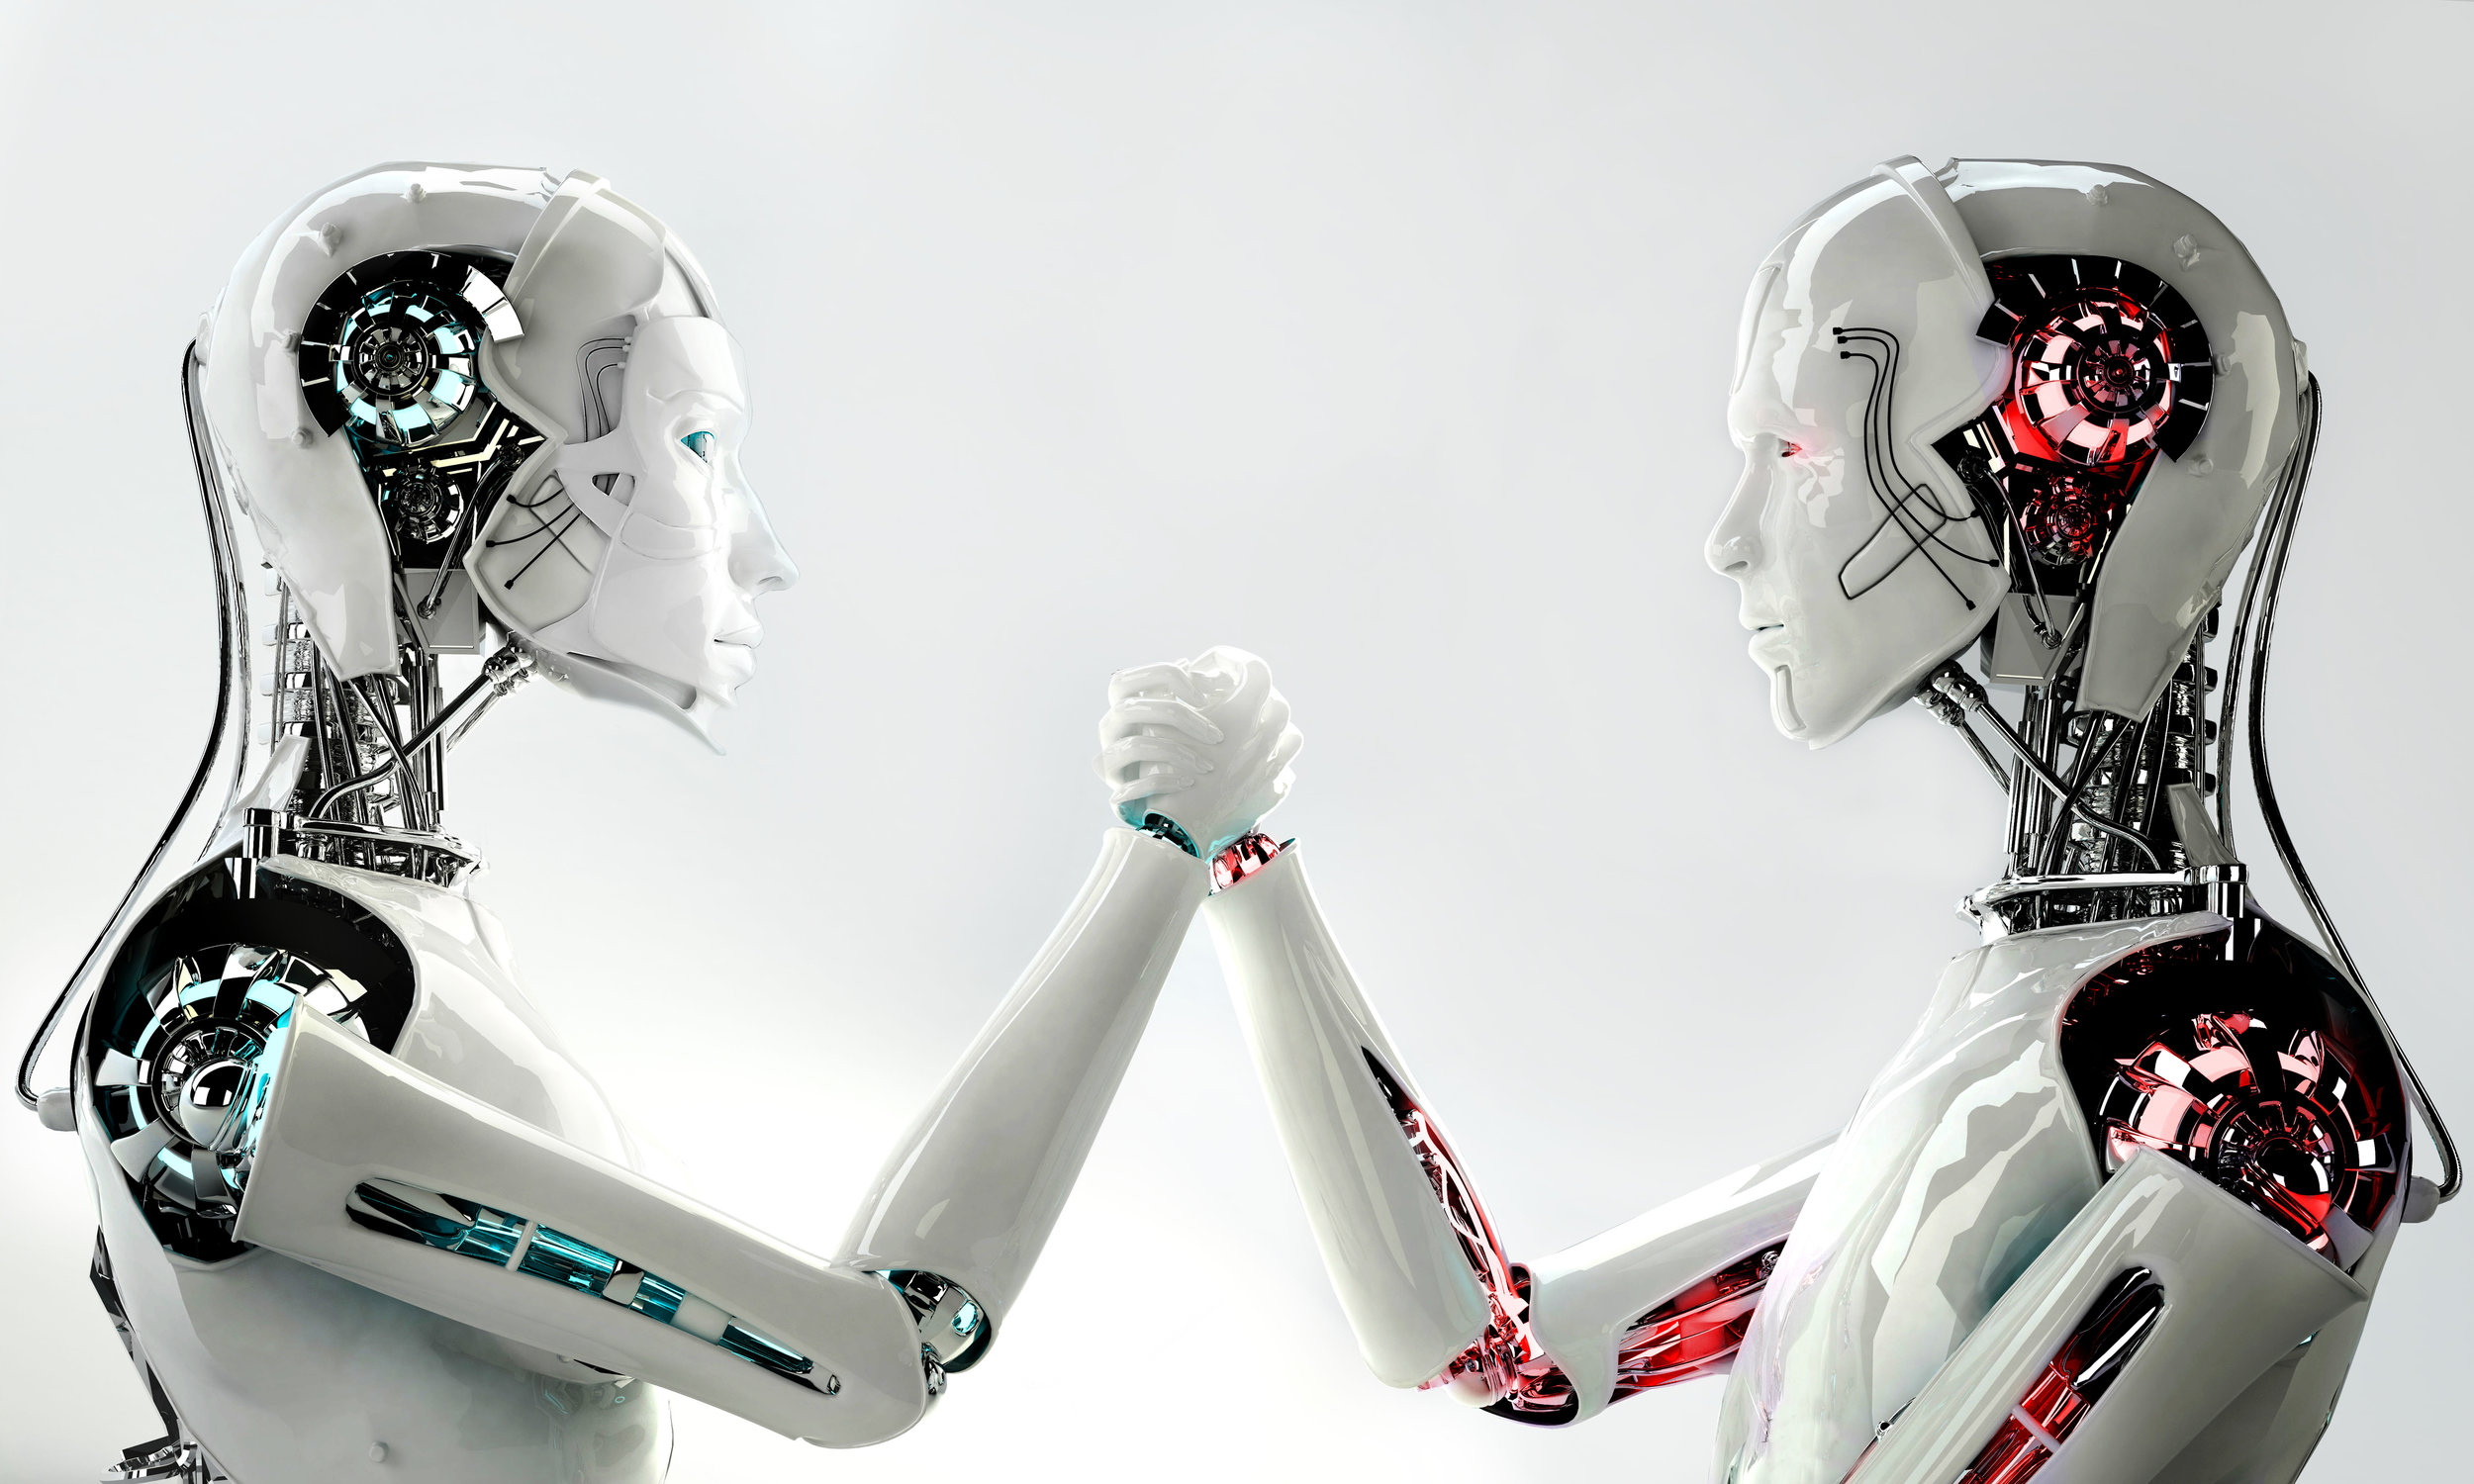 Artificial Intelligence/Robotics